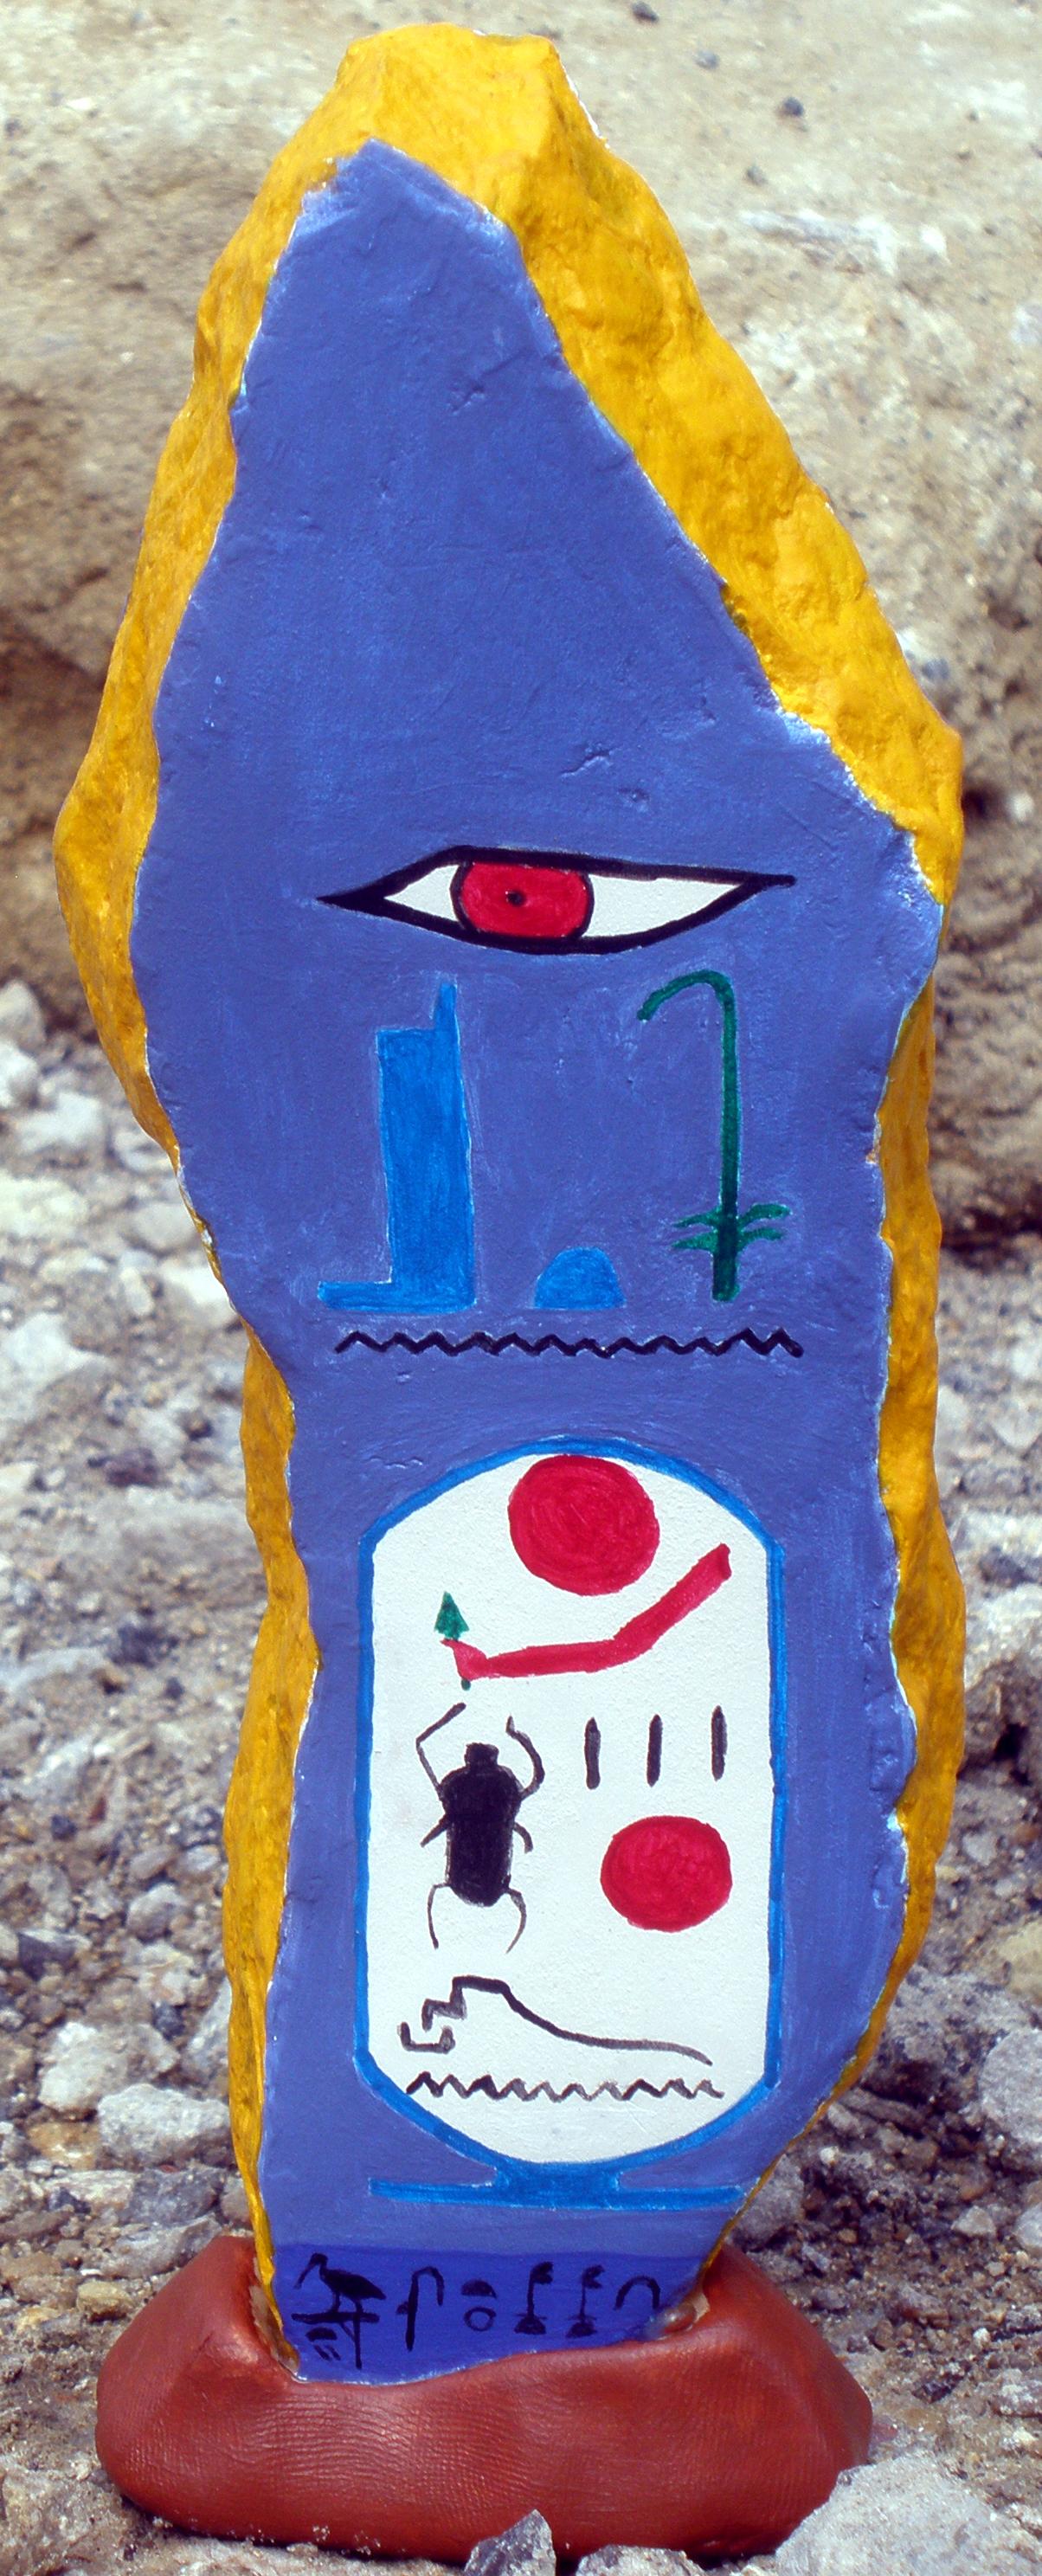 http://hieroglyphe.djehouty.free.fr/hieroglyphes/horemheb/horemheb_cartouche_haute_et_basse_egypte.jpg